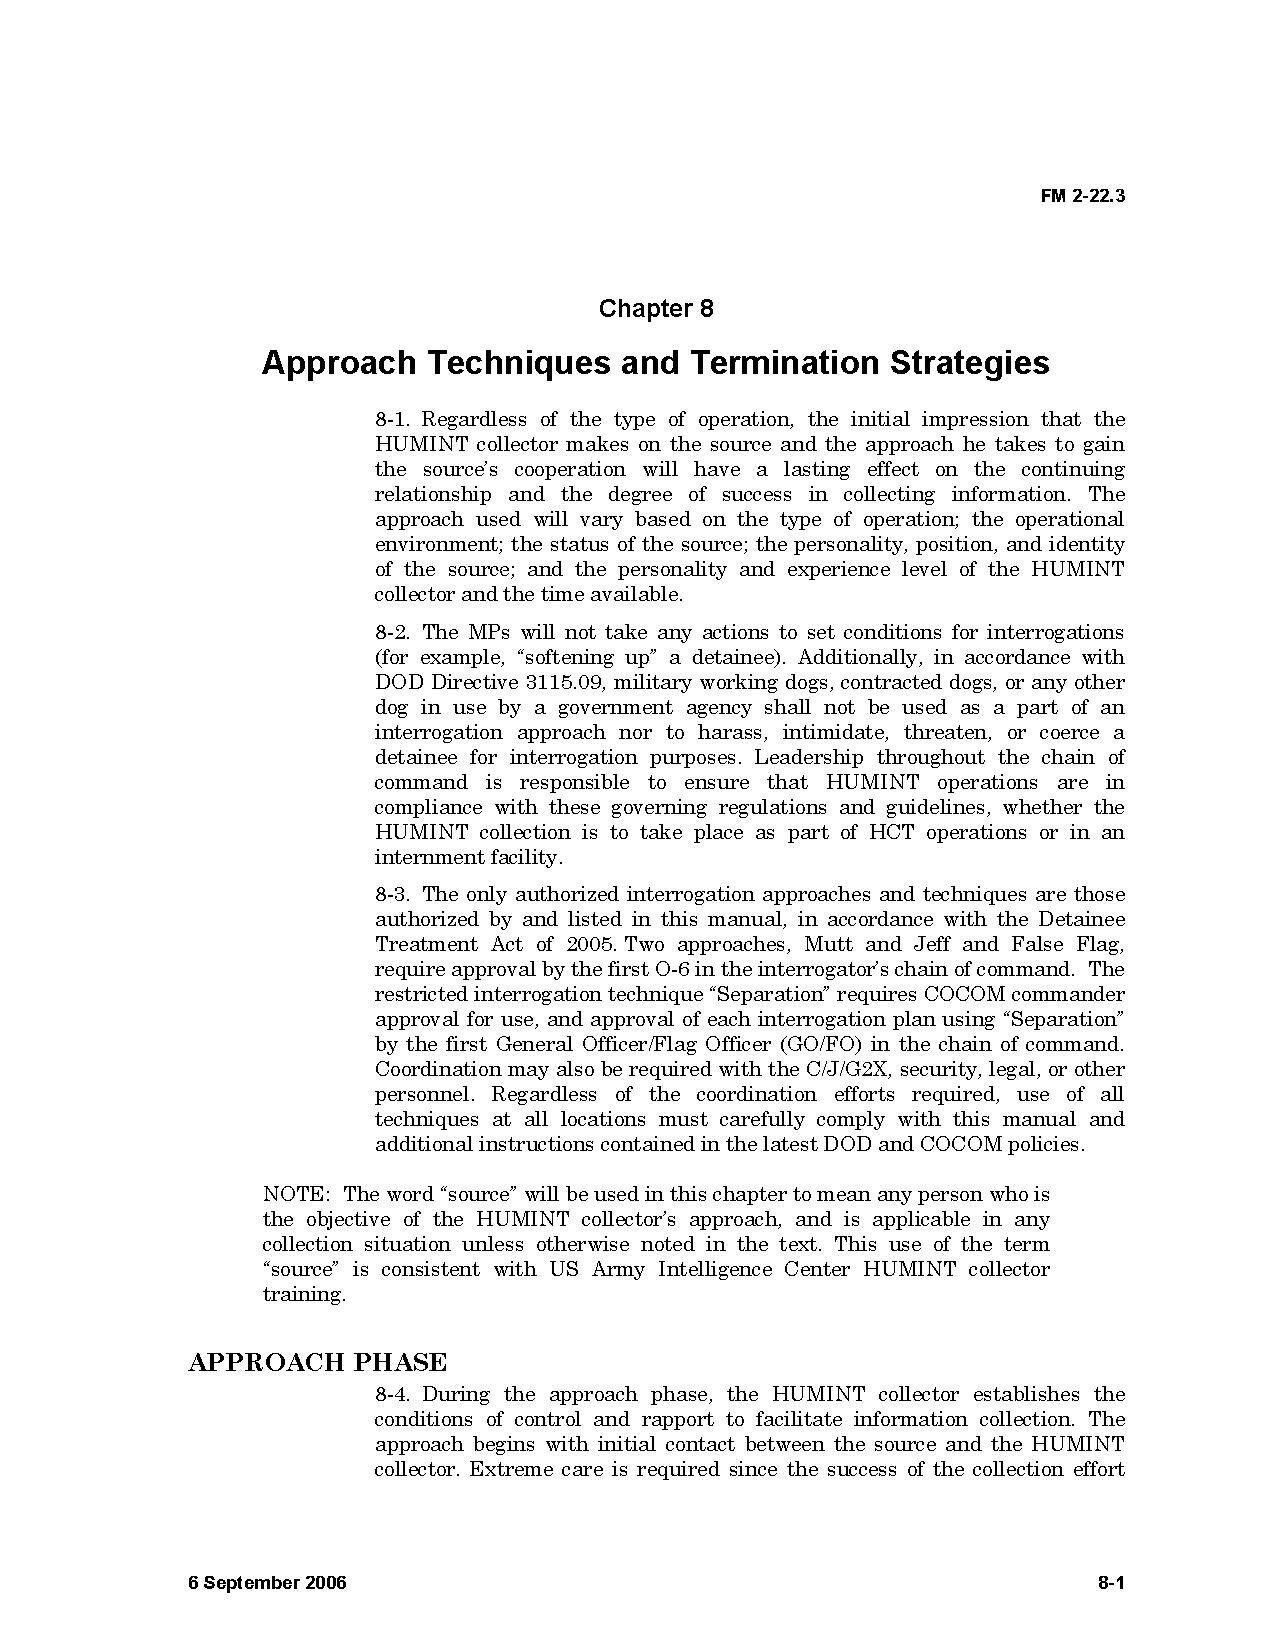 :United States Army Field Manual 2-22-3 -- on interrogation ...